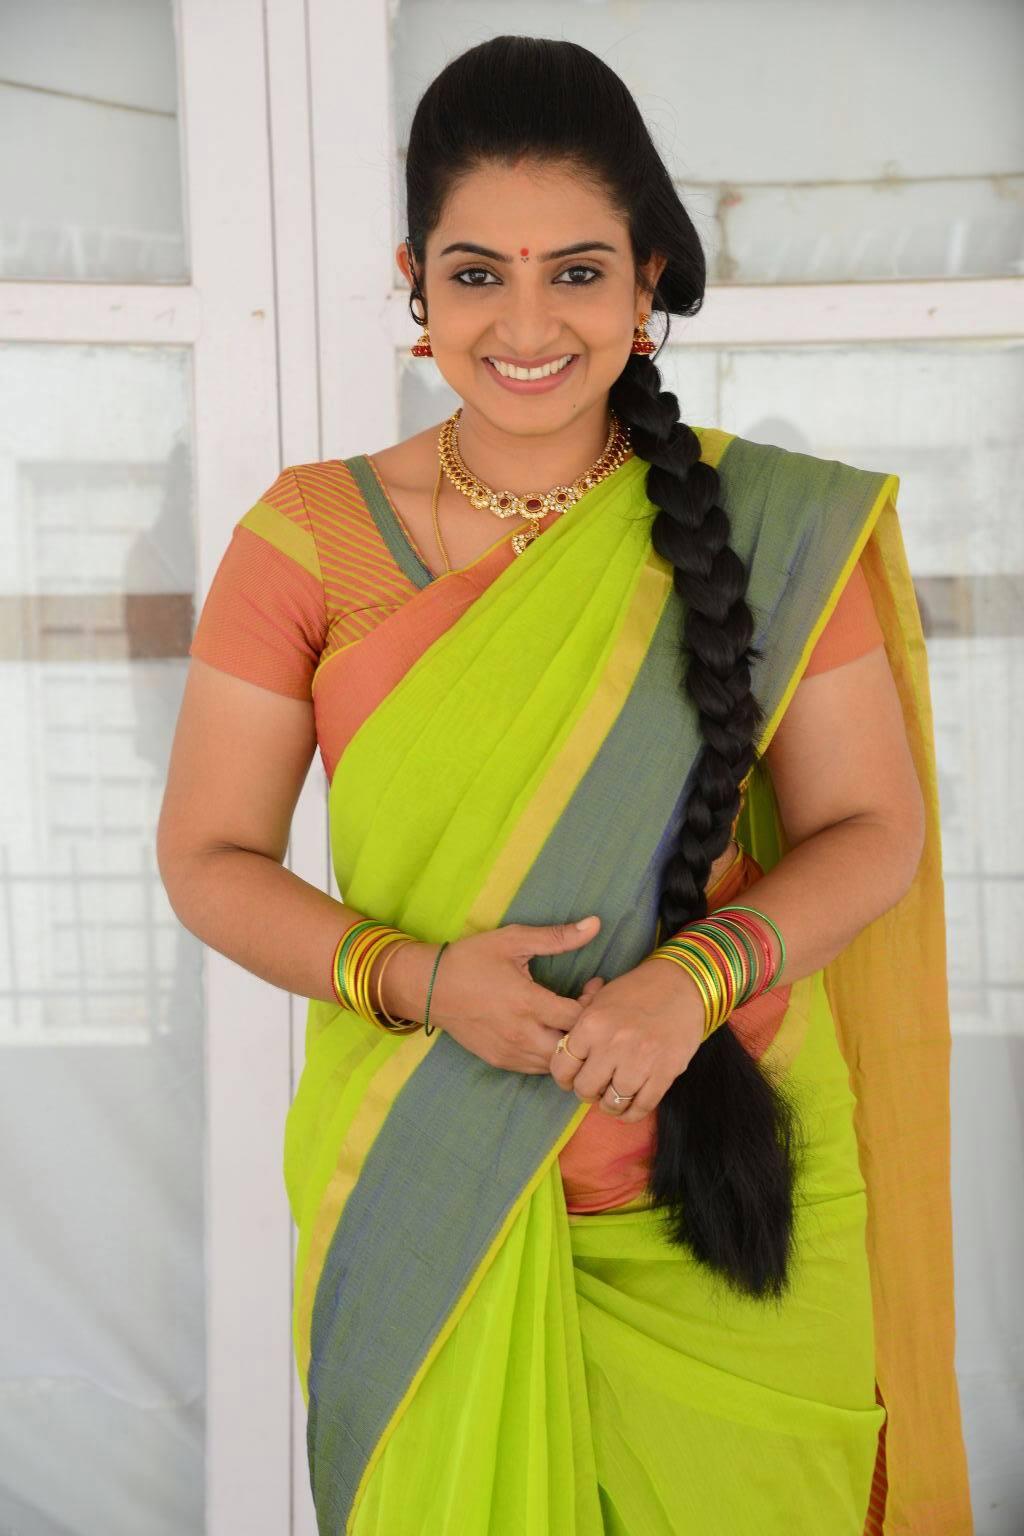 New Telugu Video Songs Youtube 2018 Gastronomia Y Viajes